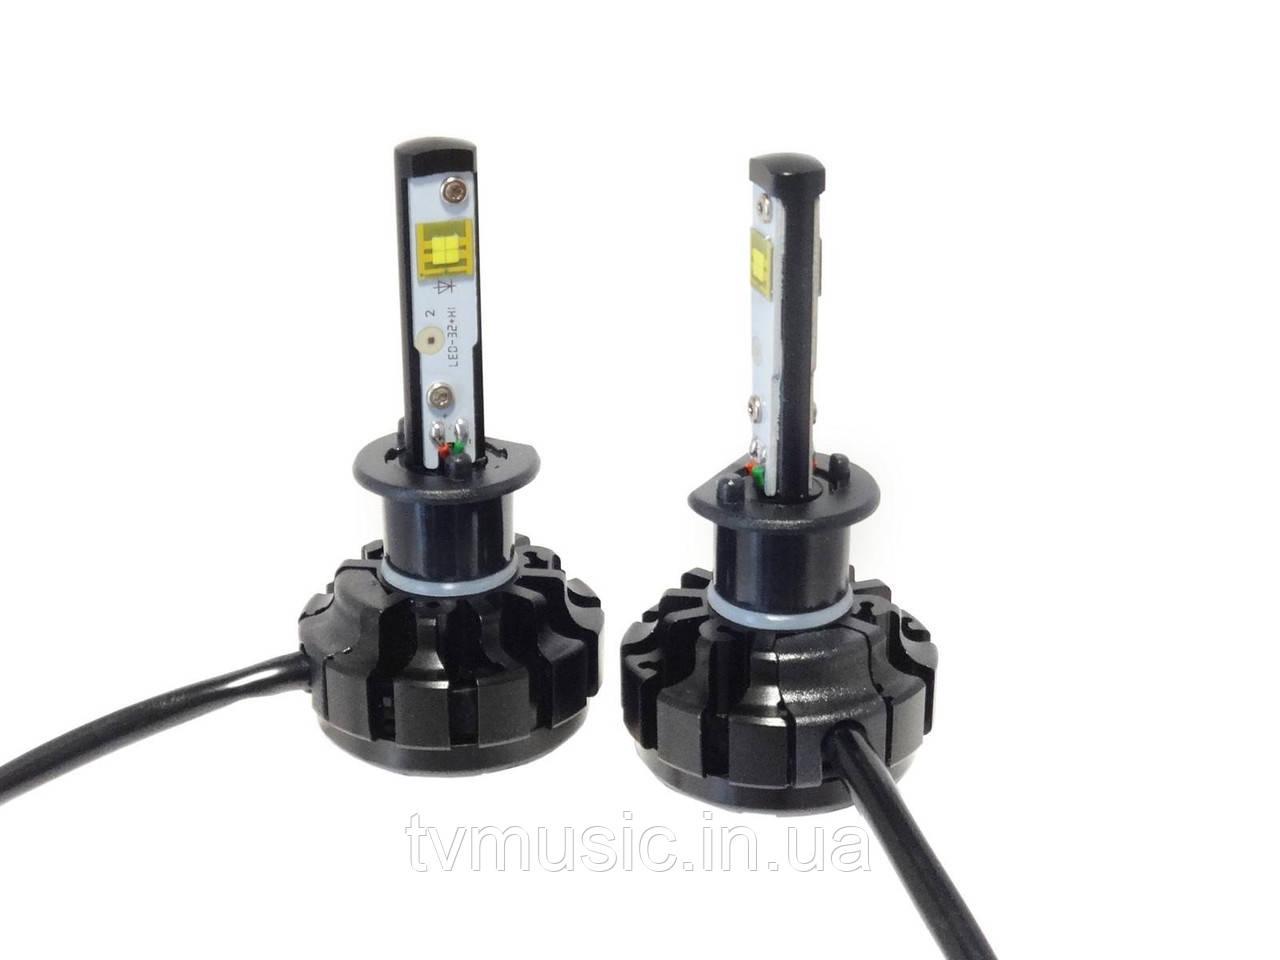 LED лампы Sho Me G1.4 H1 6000K 40W